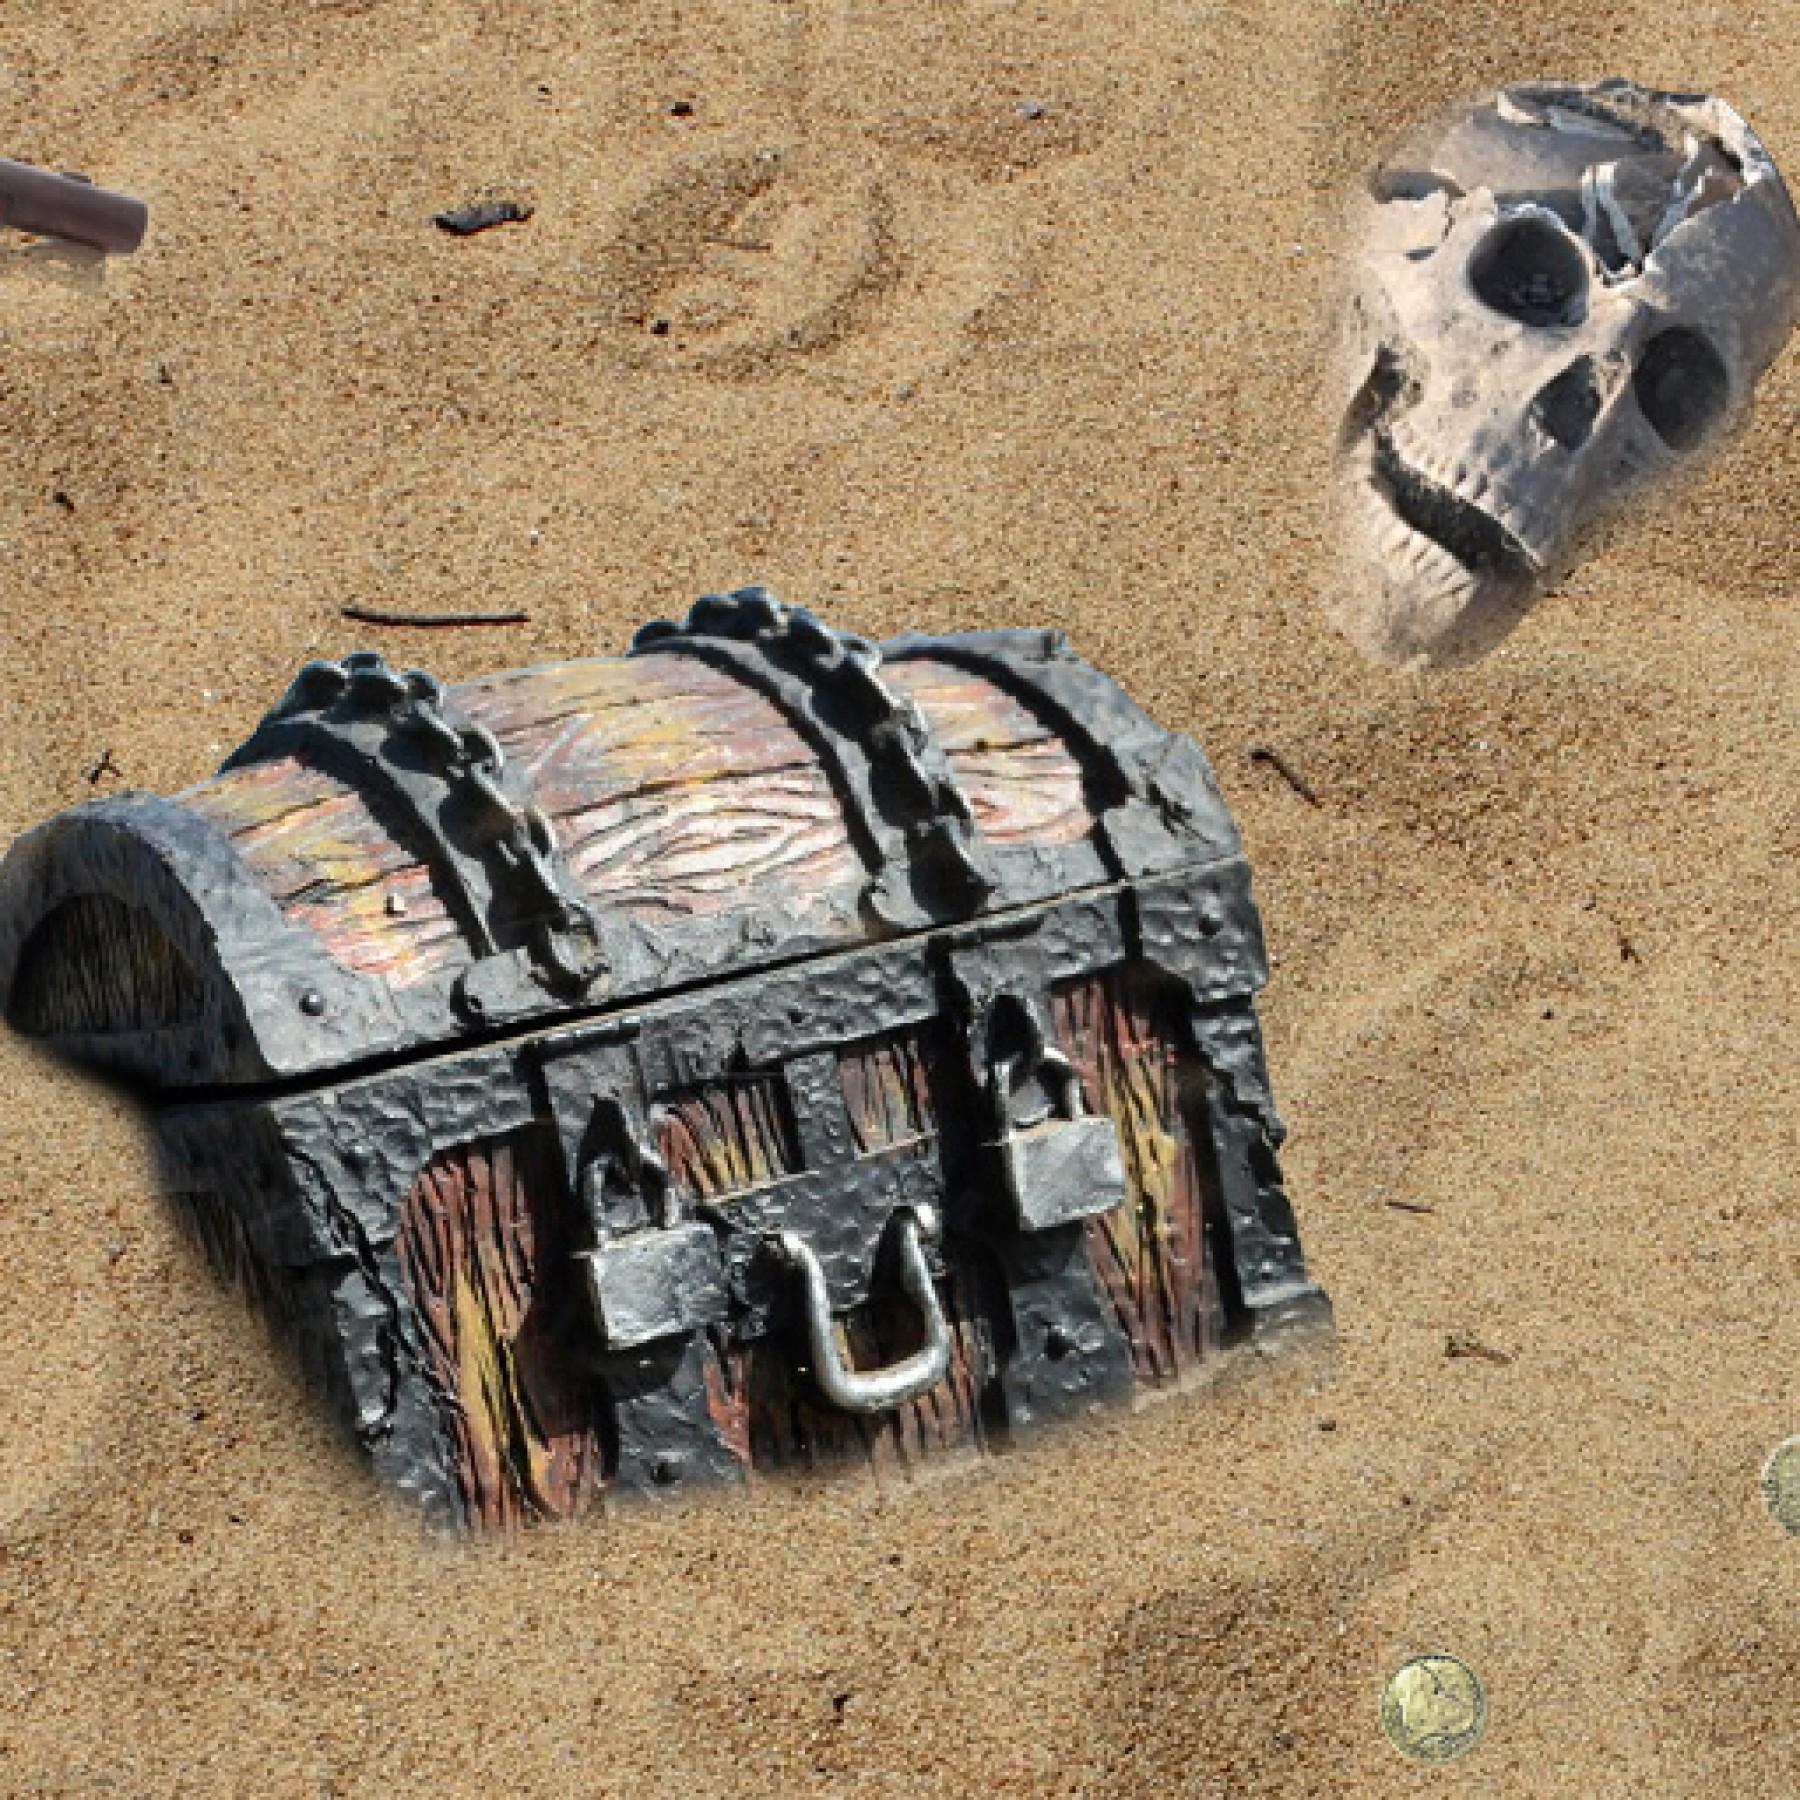 treasure-hunter-history-travel-adventure-kids-mysterious-main-location1